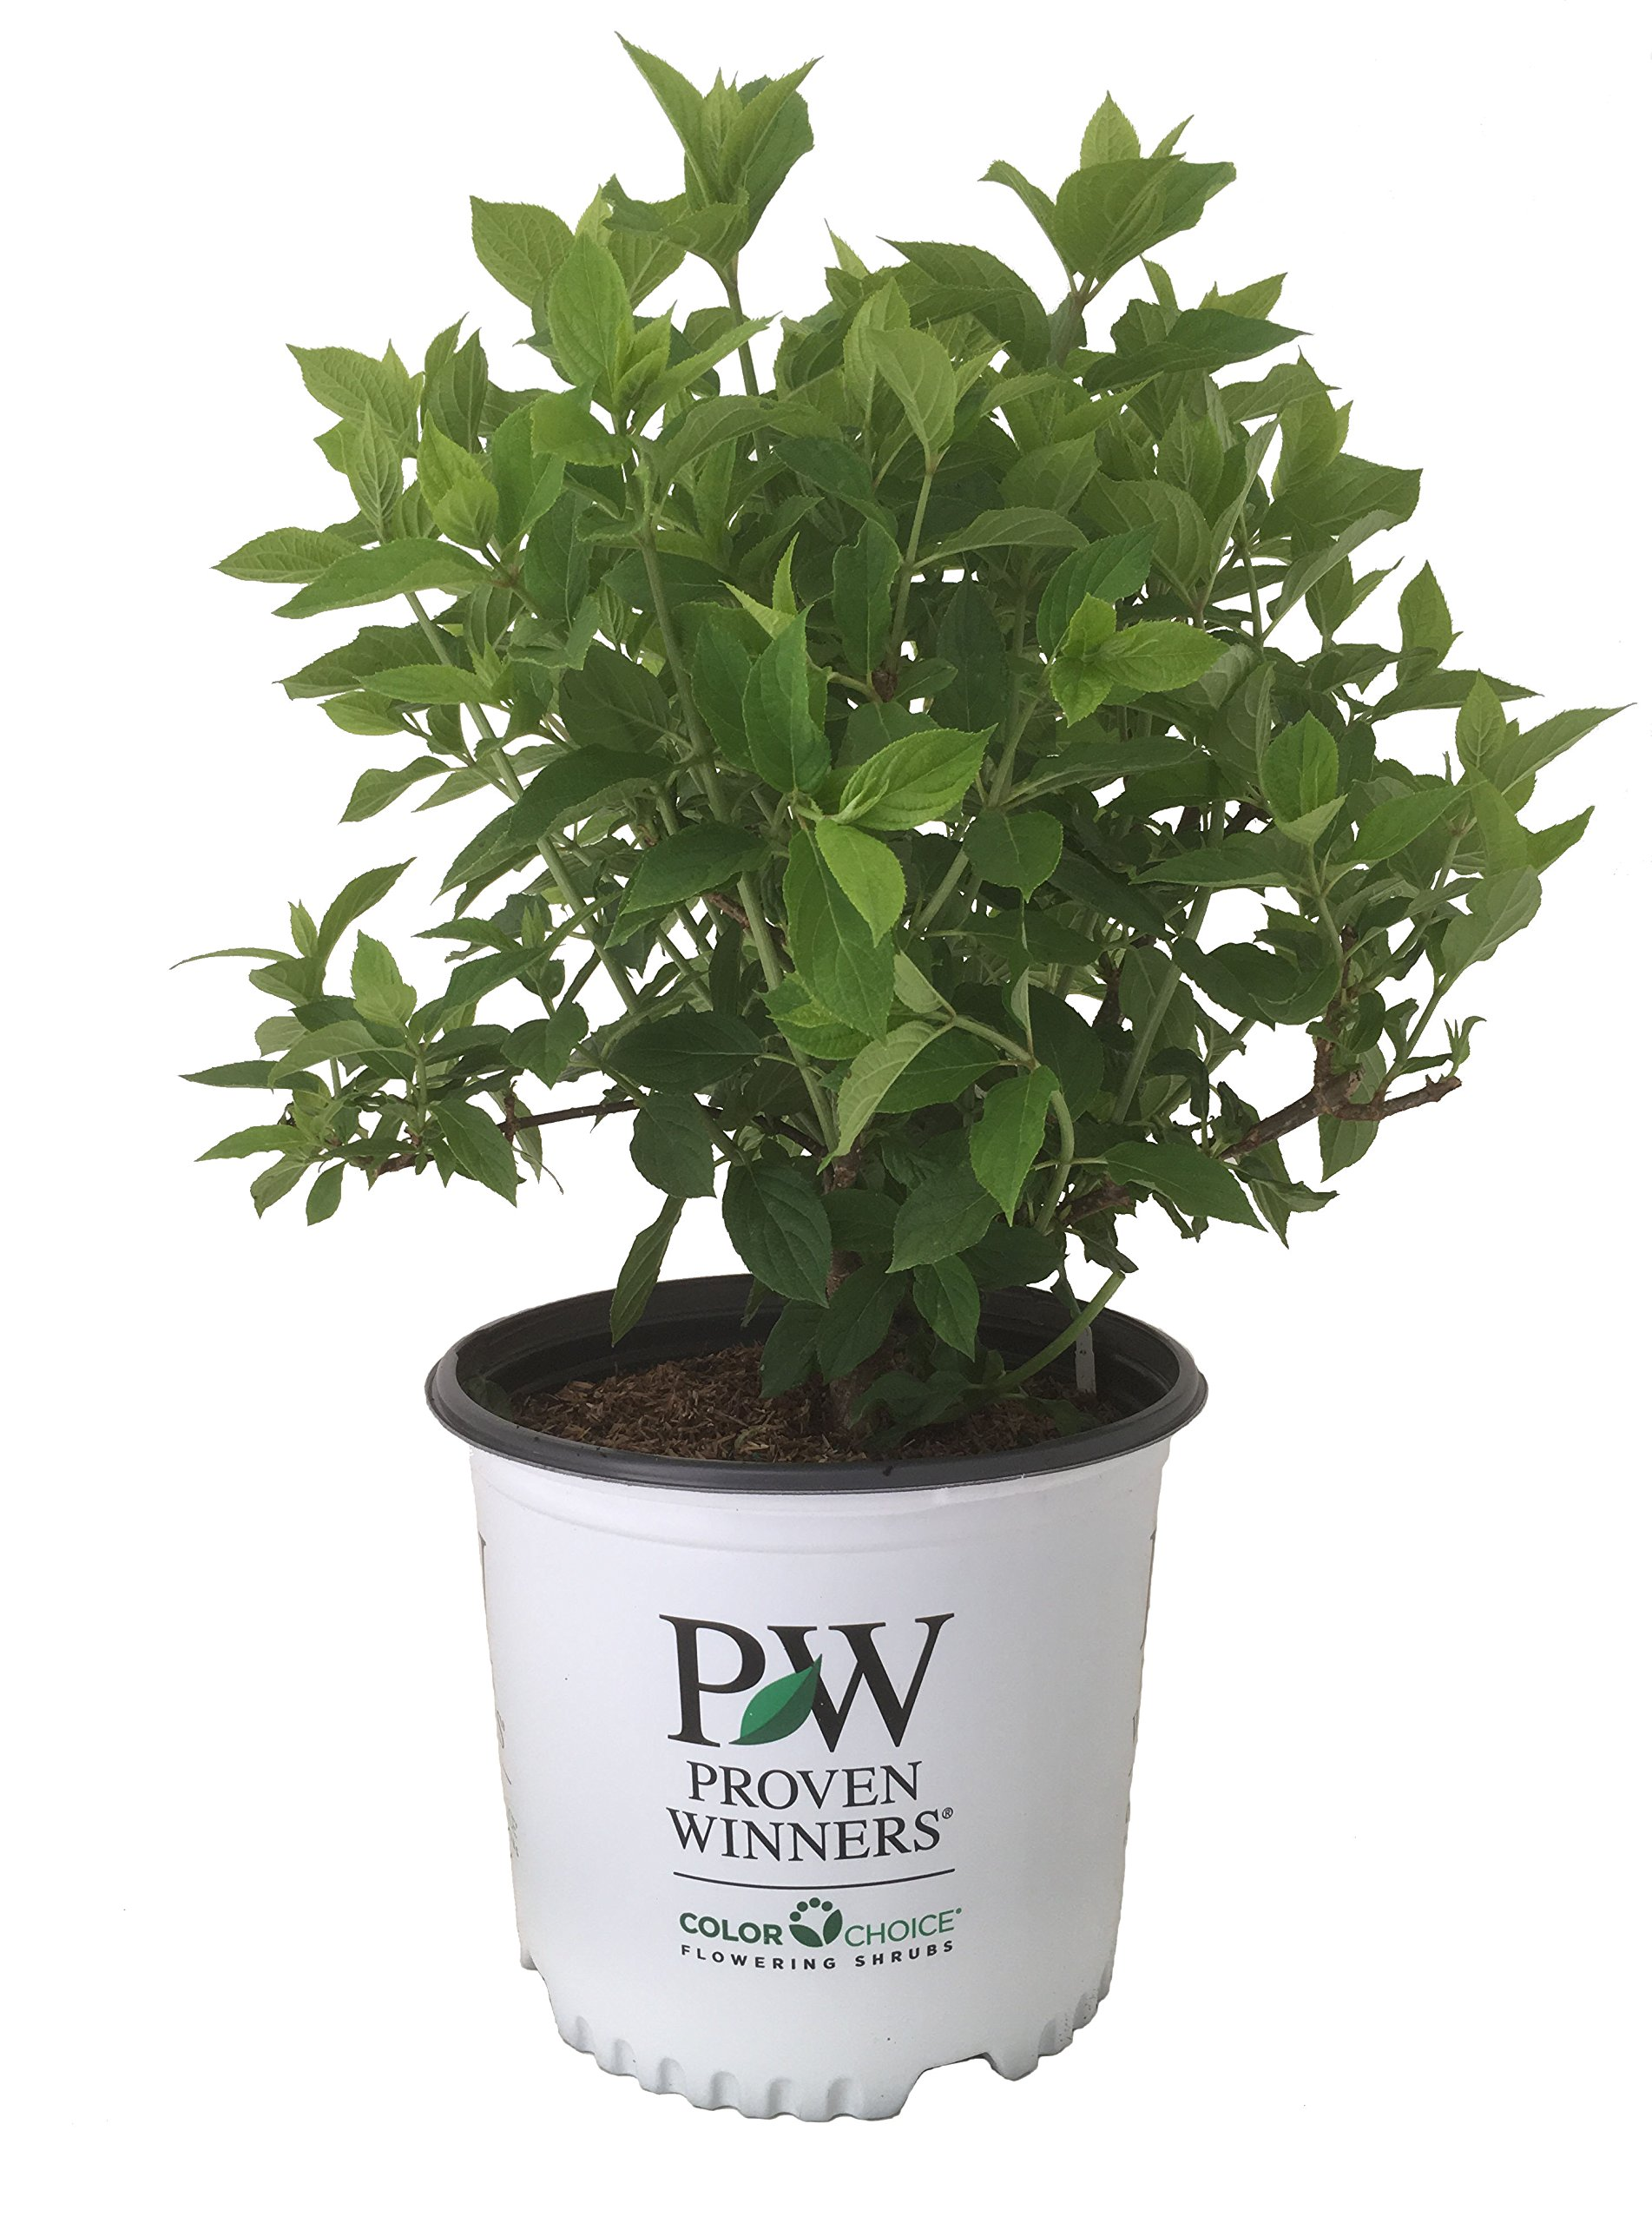 Proven Winners Limelight Hydrangea - Hydrangea P Limelight - 3 Gallon